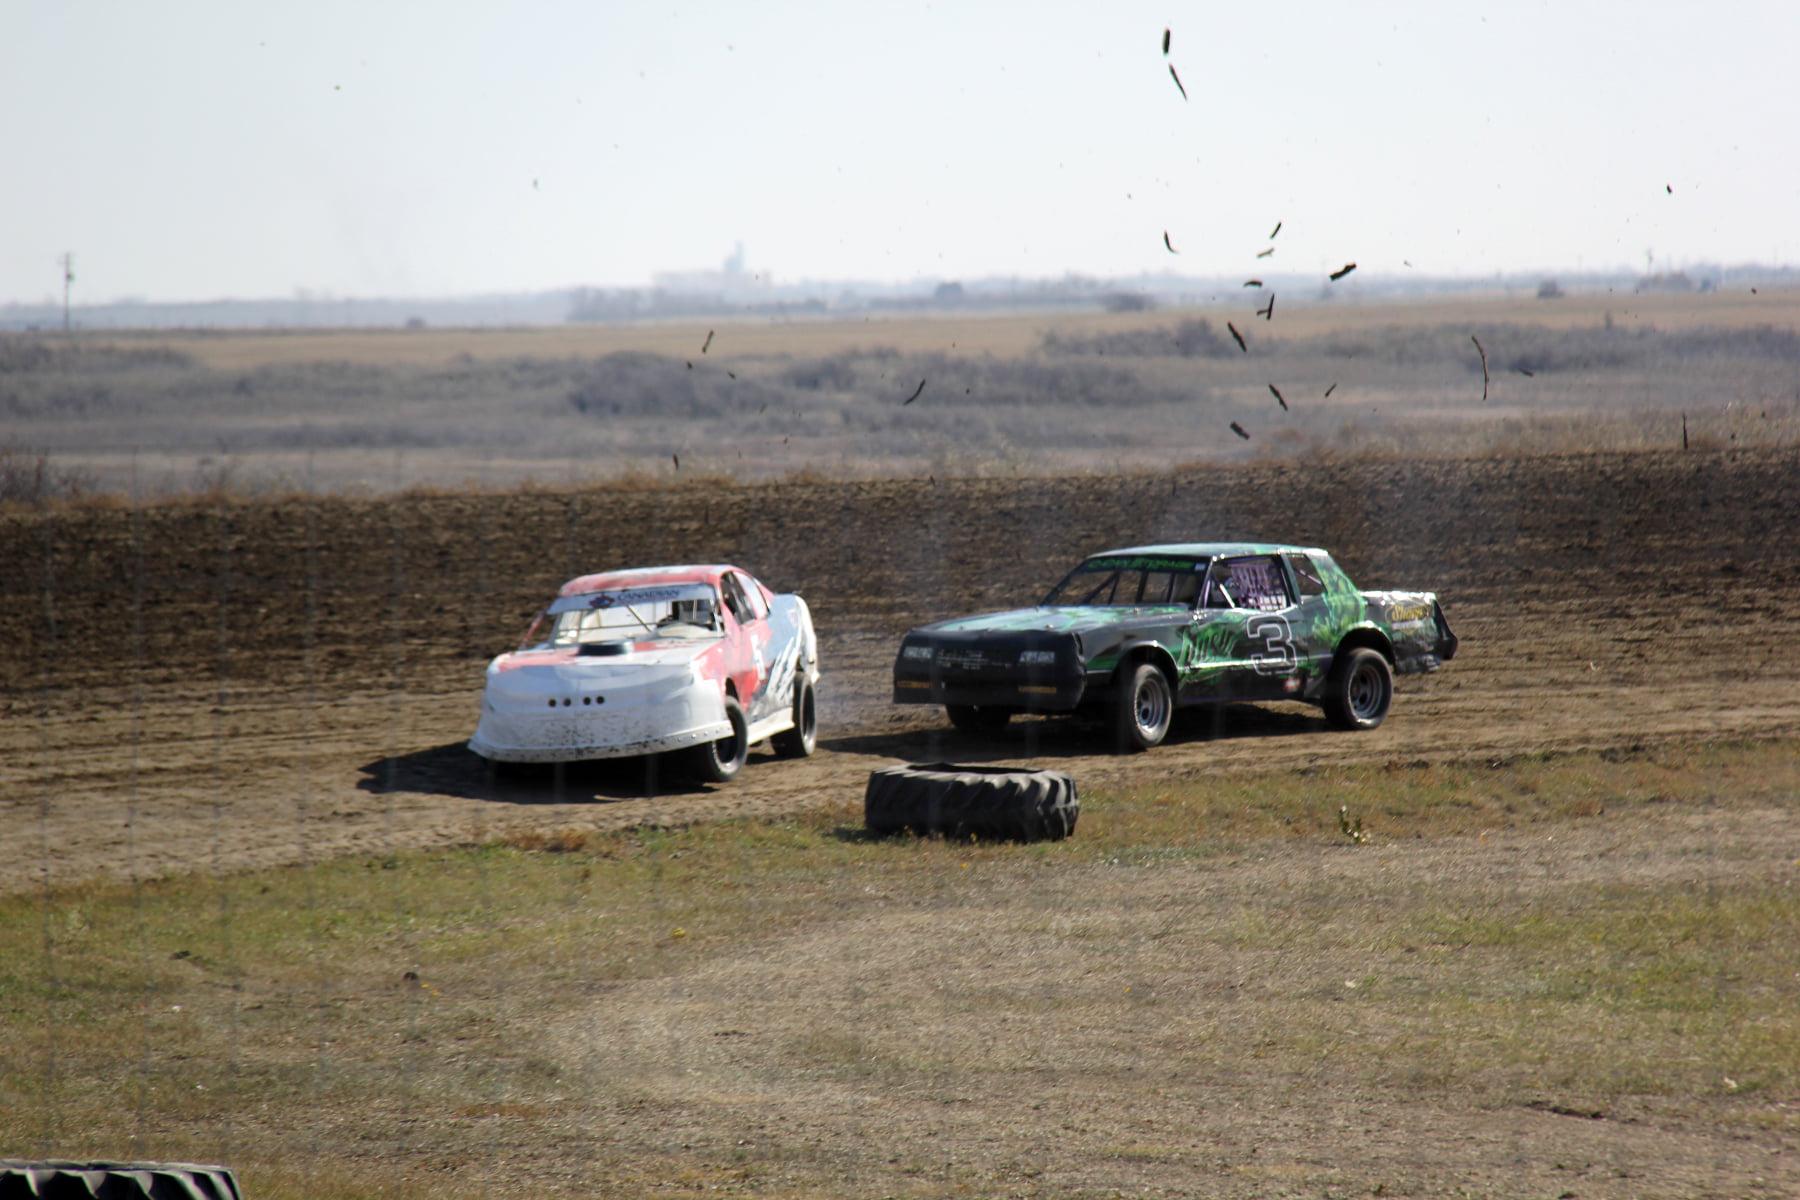 Outlook_Racing_Kemmer_Racing_Photography_6.jpg